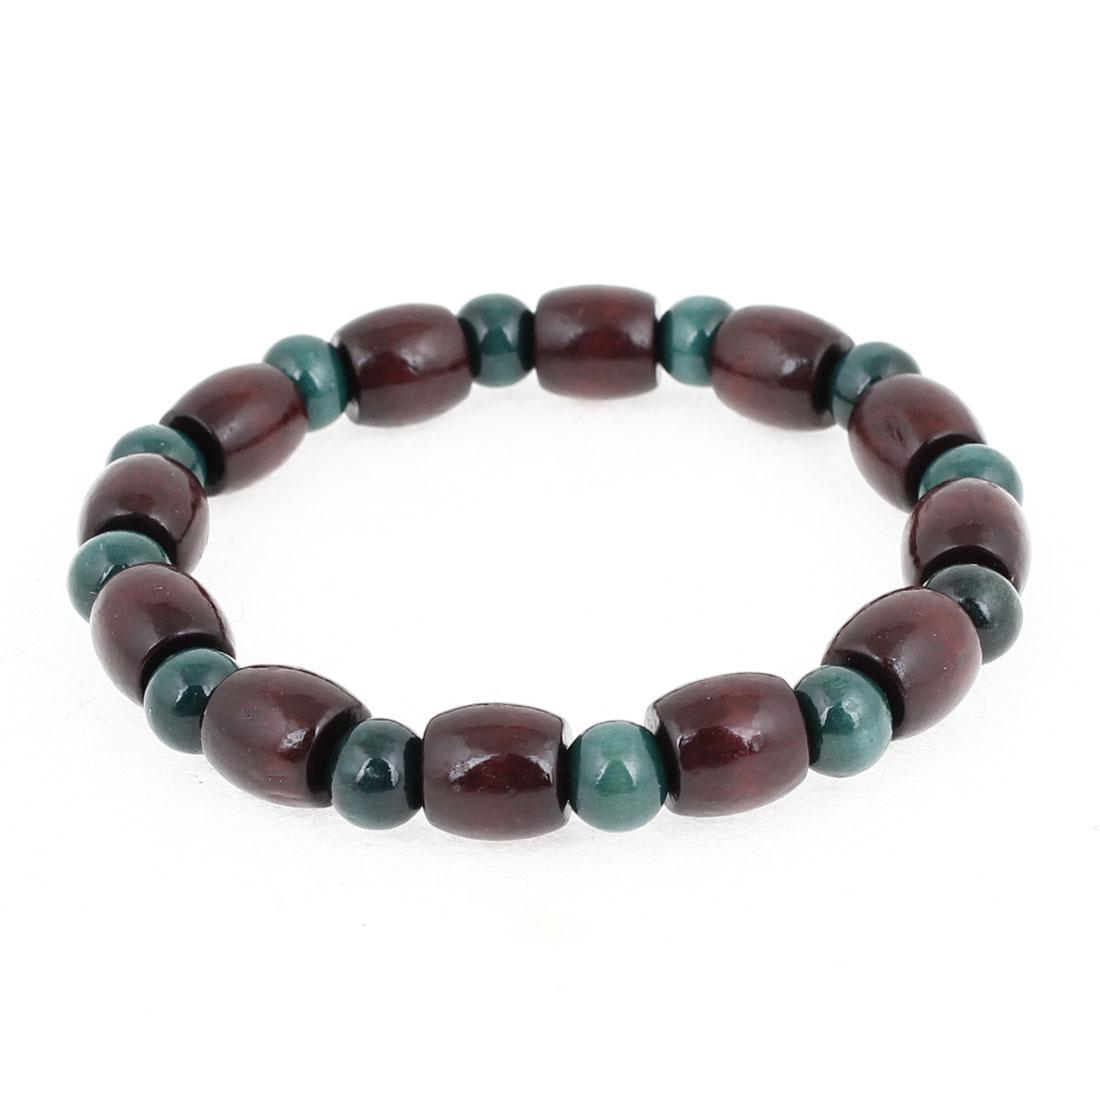 Plastic Green Round Burgundy Cylindrical Shape Beads Decor Elastic Bracelet